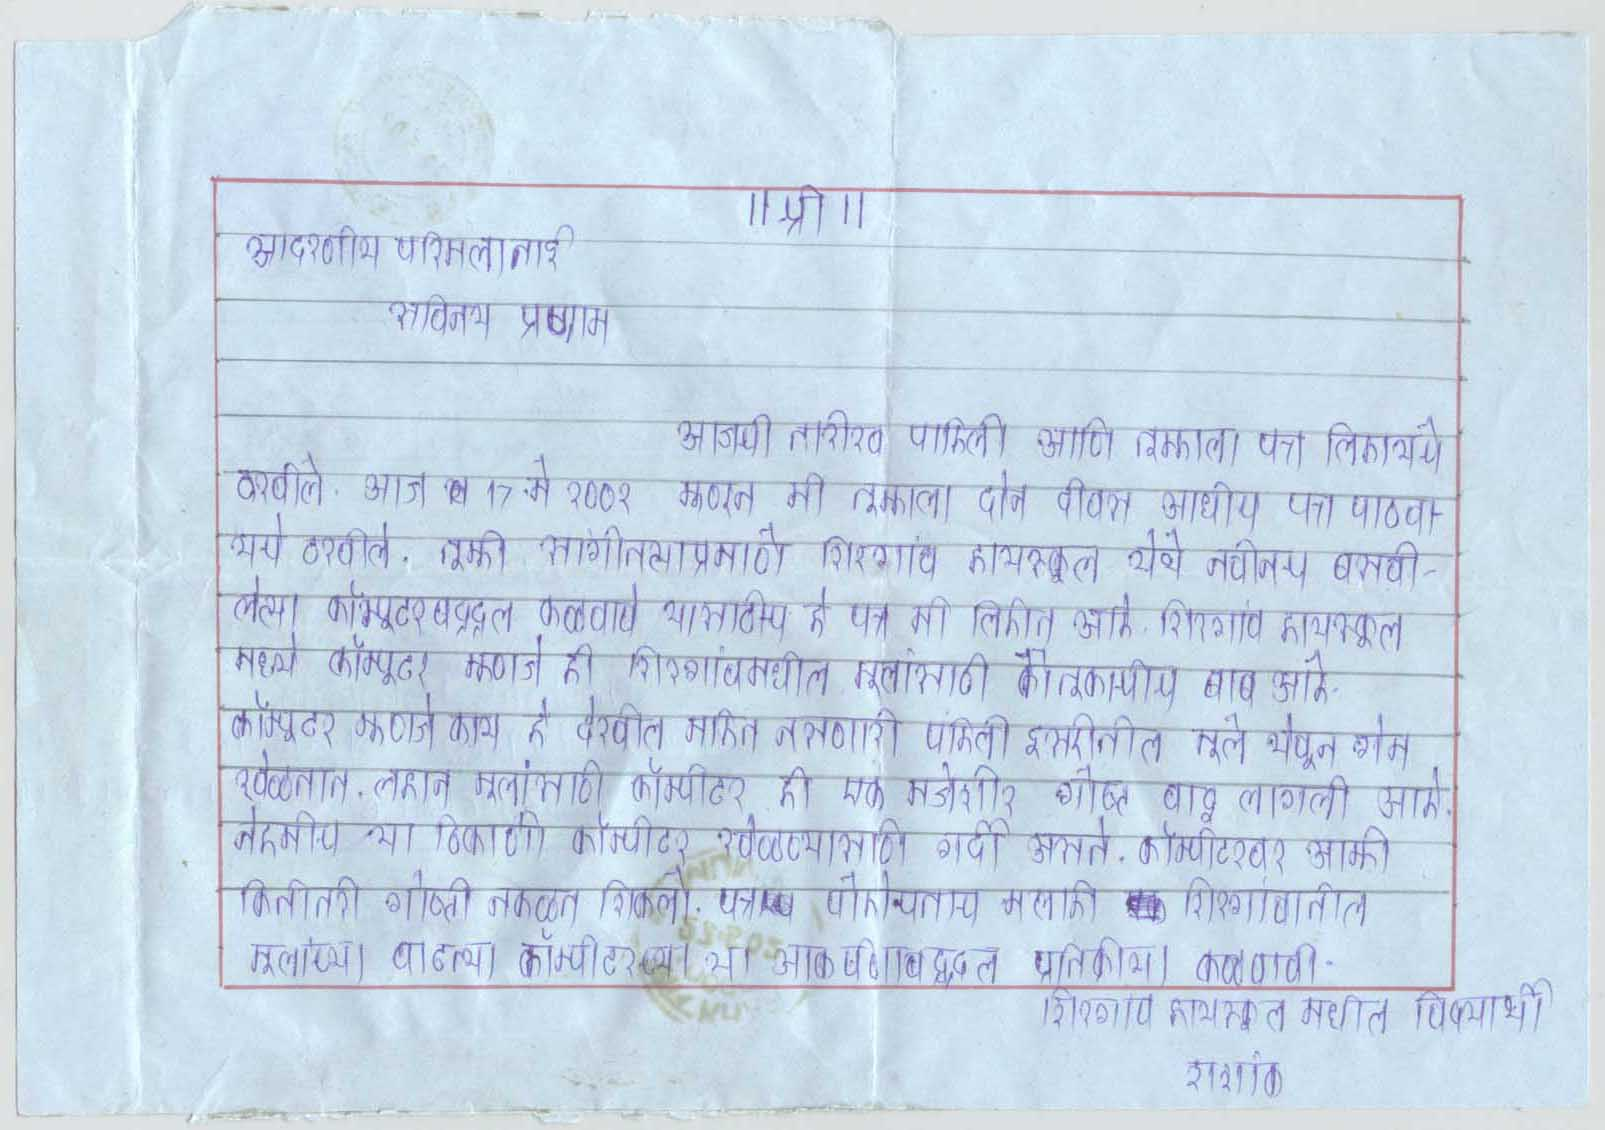 how to write love letter in hindi First love letter (gujarati) shayri-e-ishq tara pyar thi saru thai che aa safar, manzil malse ke nahin male kaune khabar.